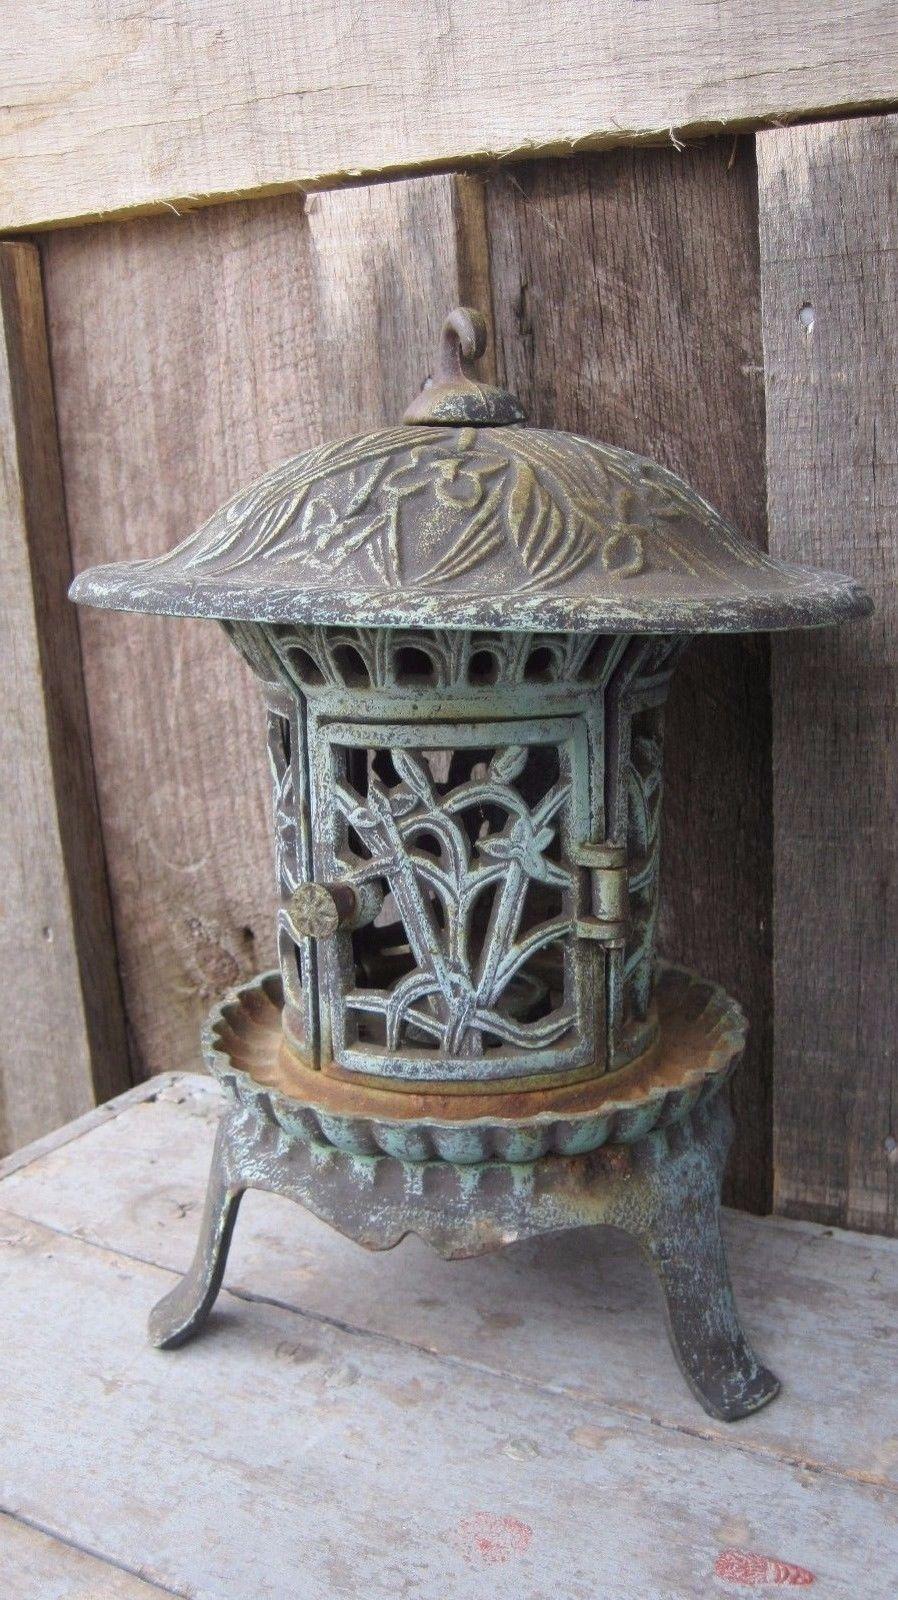 Heavy vintage cast iron pagoda home garden planter candle holder